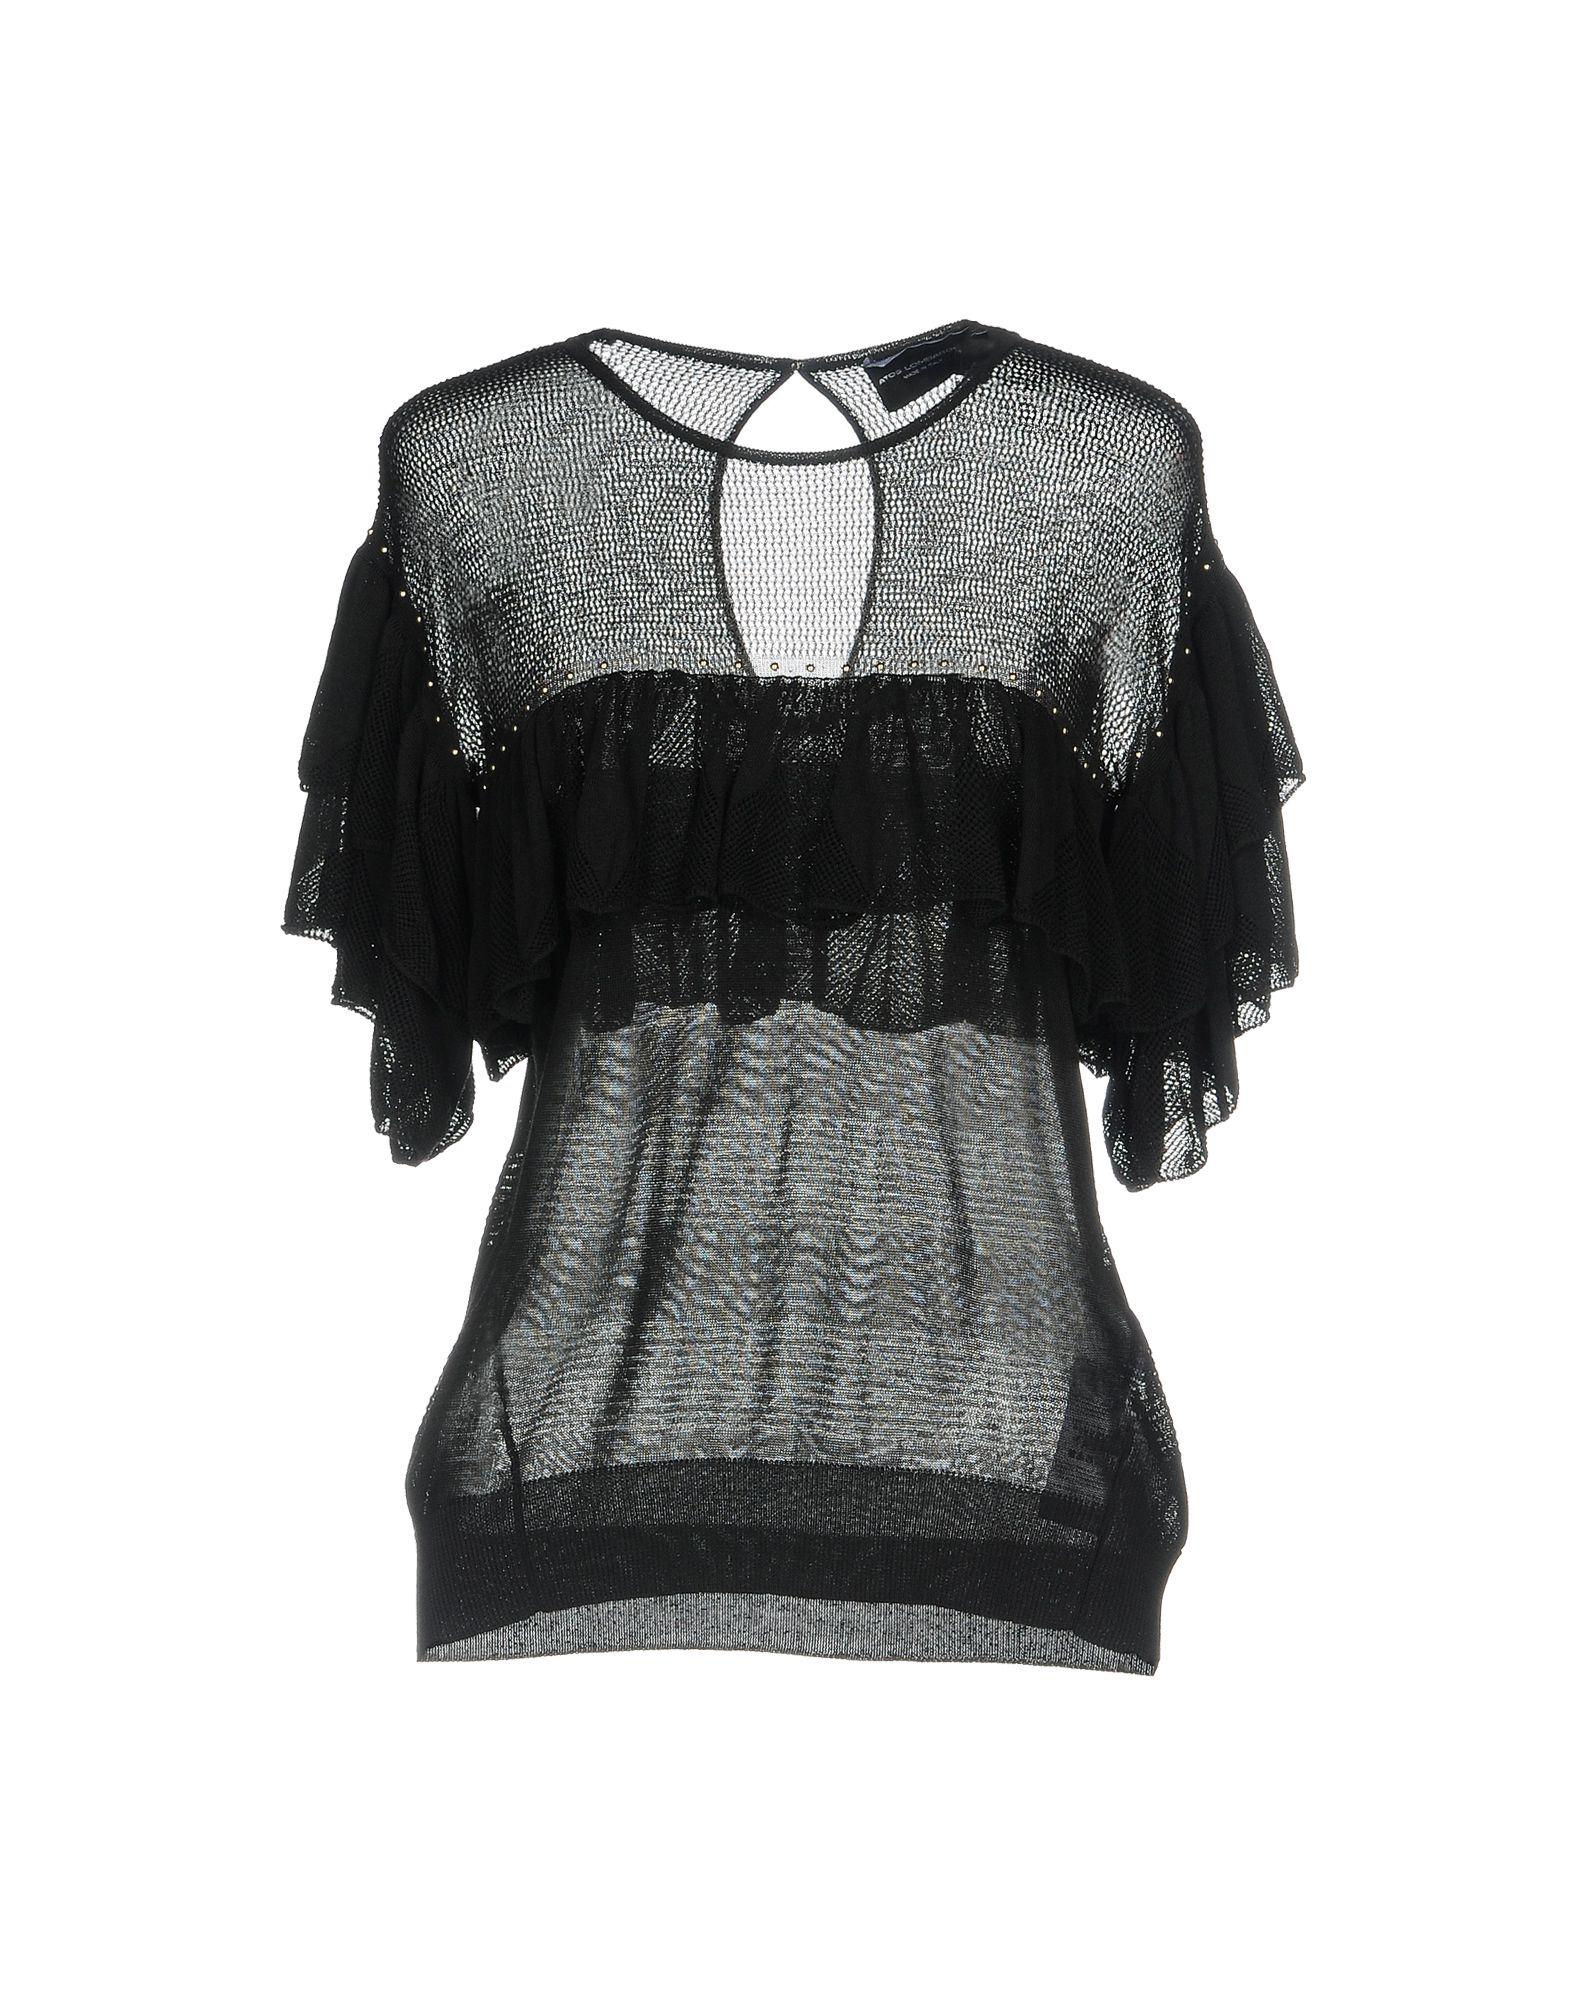 ATOS LOMBARDINI Sweater in Black